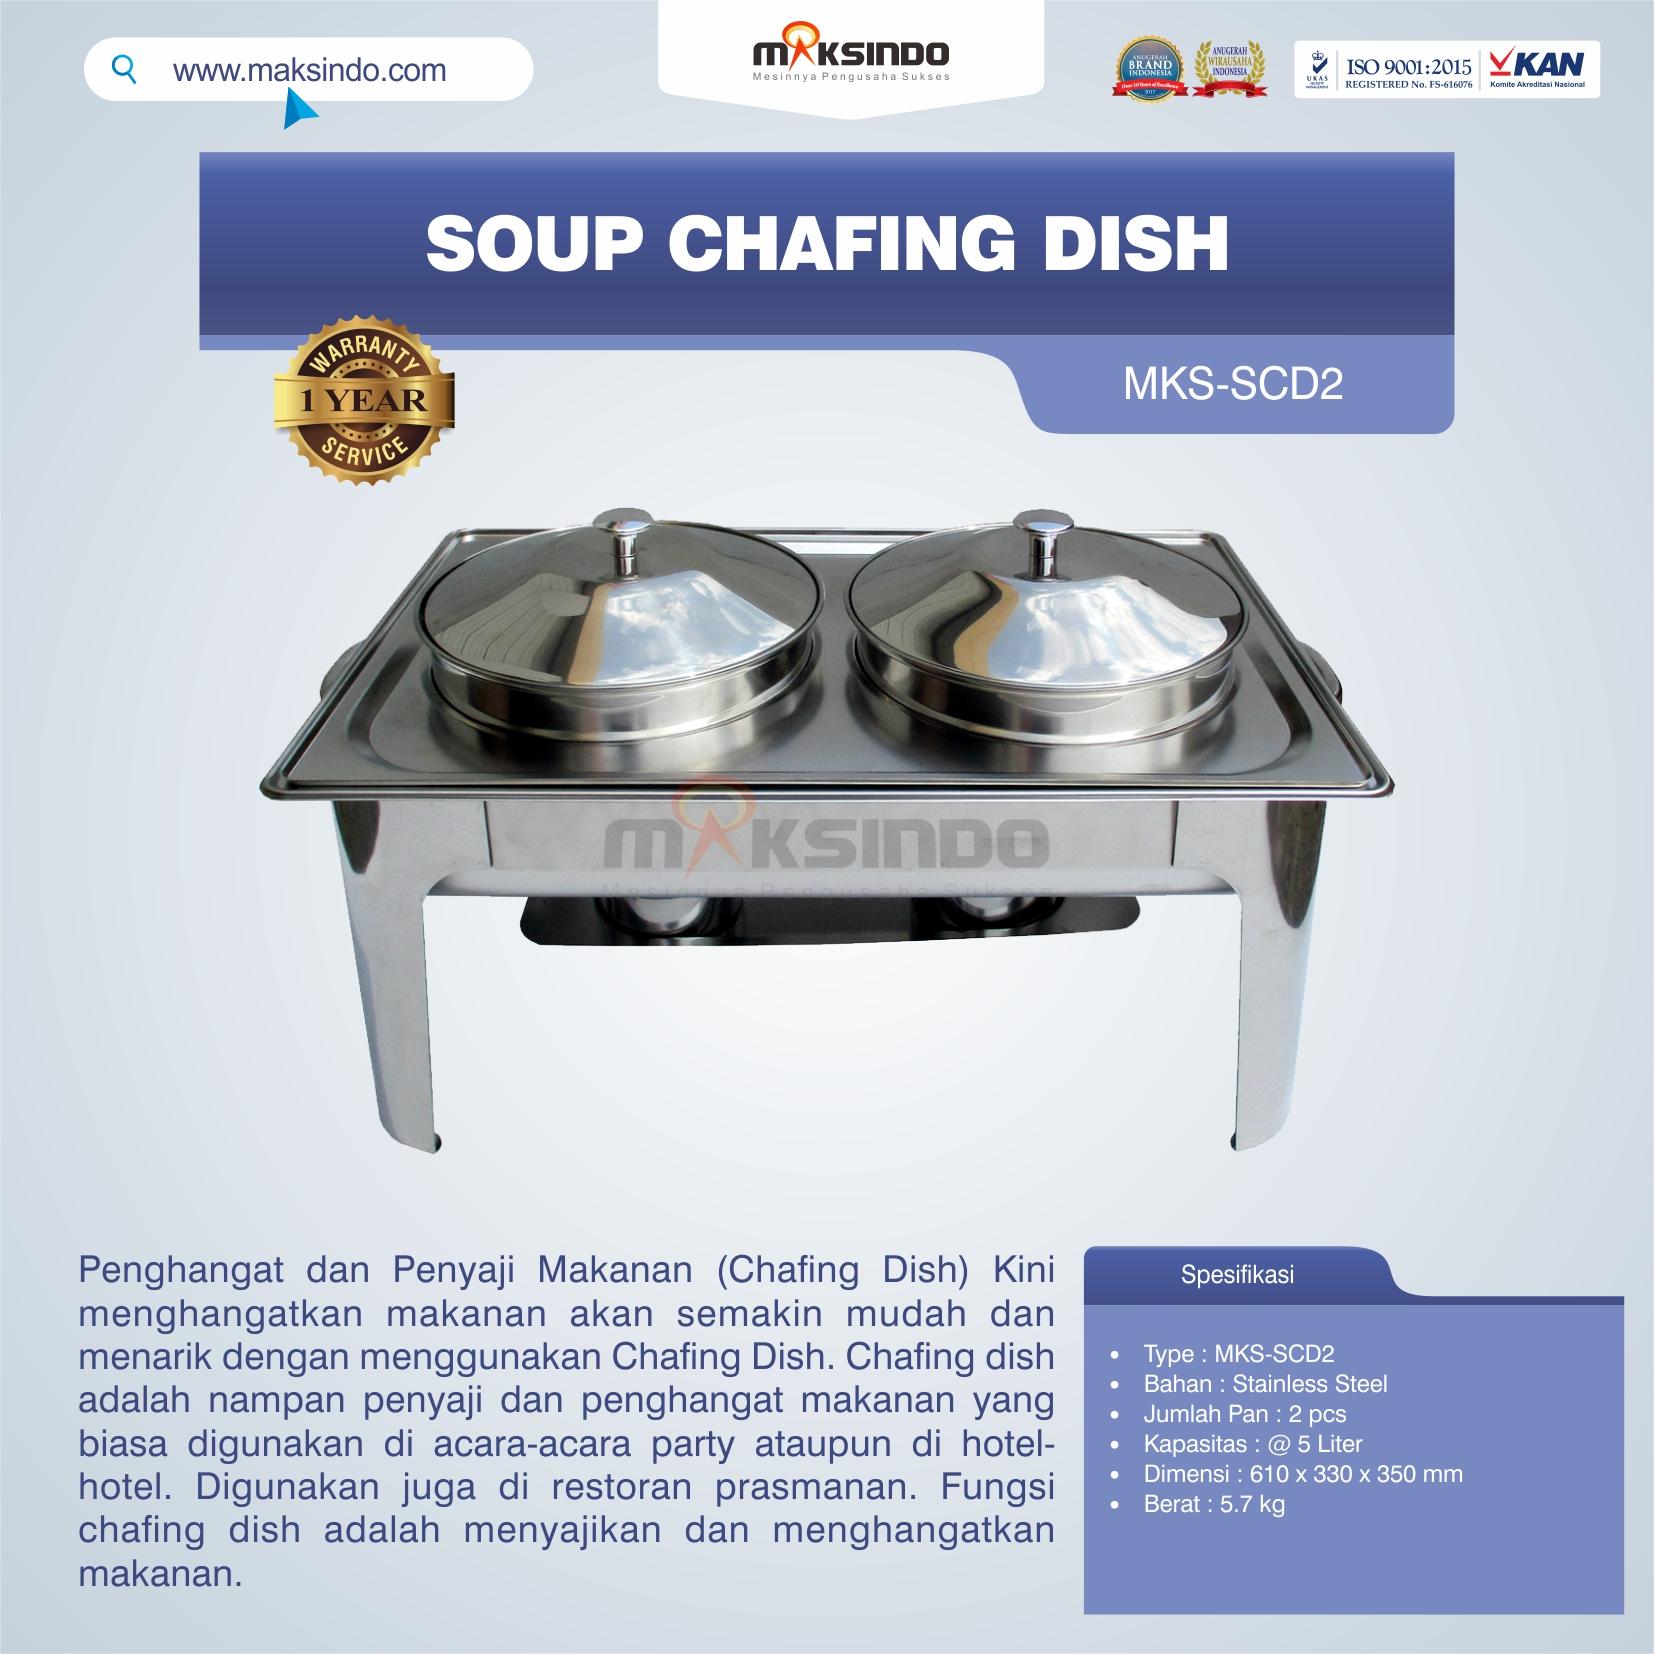 Jual Soup Chafing Dish MKS-SCD2 di Bali